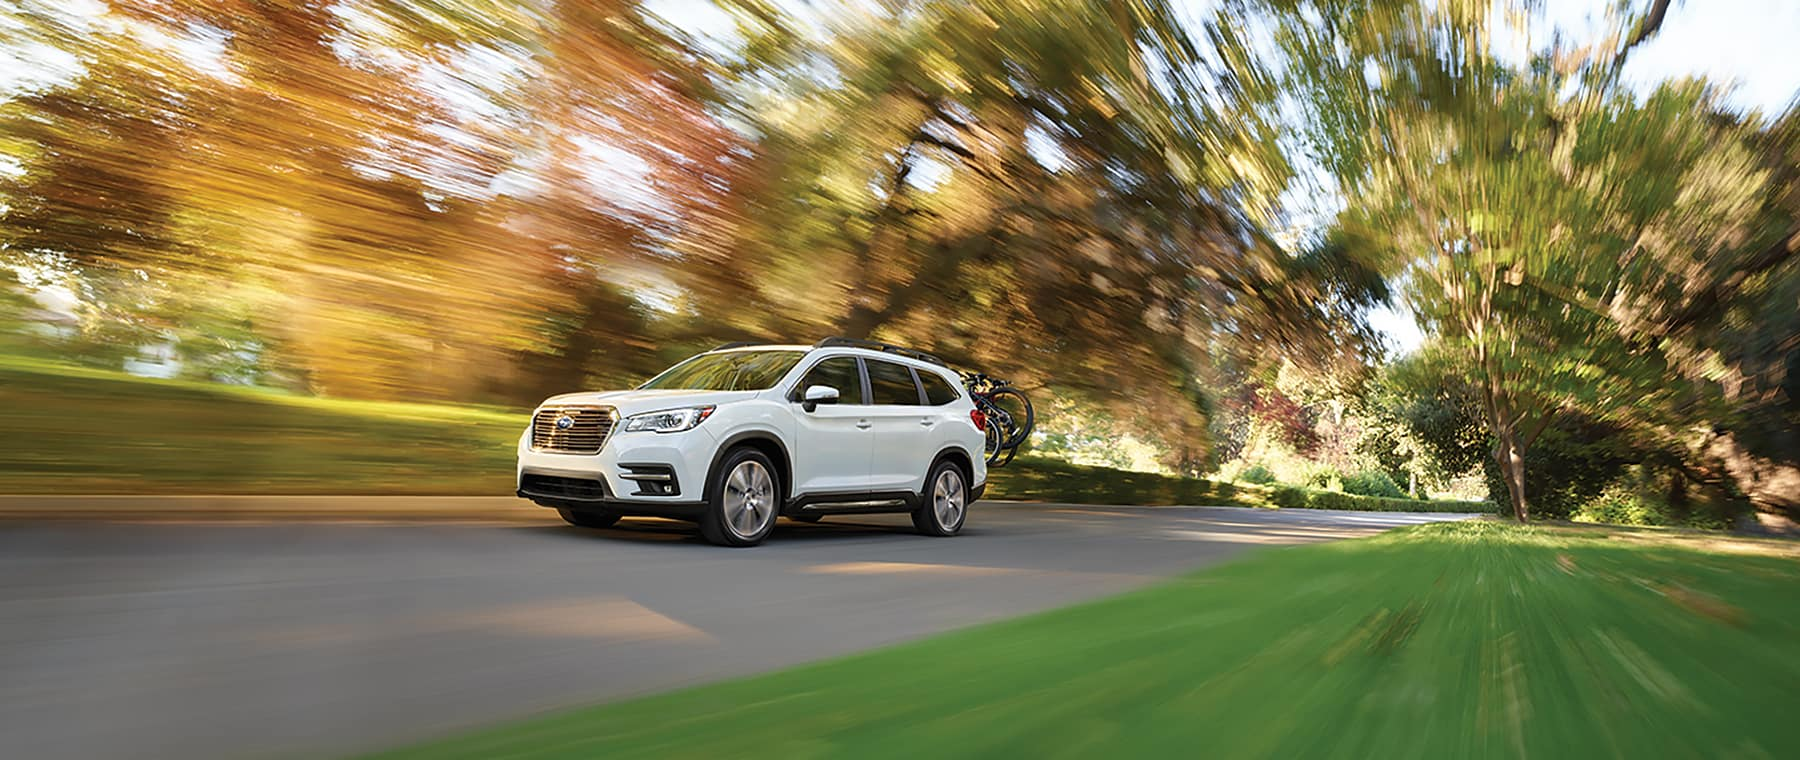 Subaru subaru pictures : Wilsonville Subaru | Subaru Dealer in Wilsonville, OR